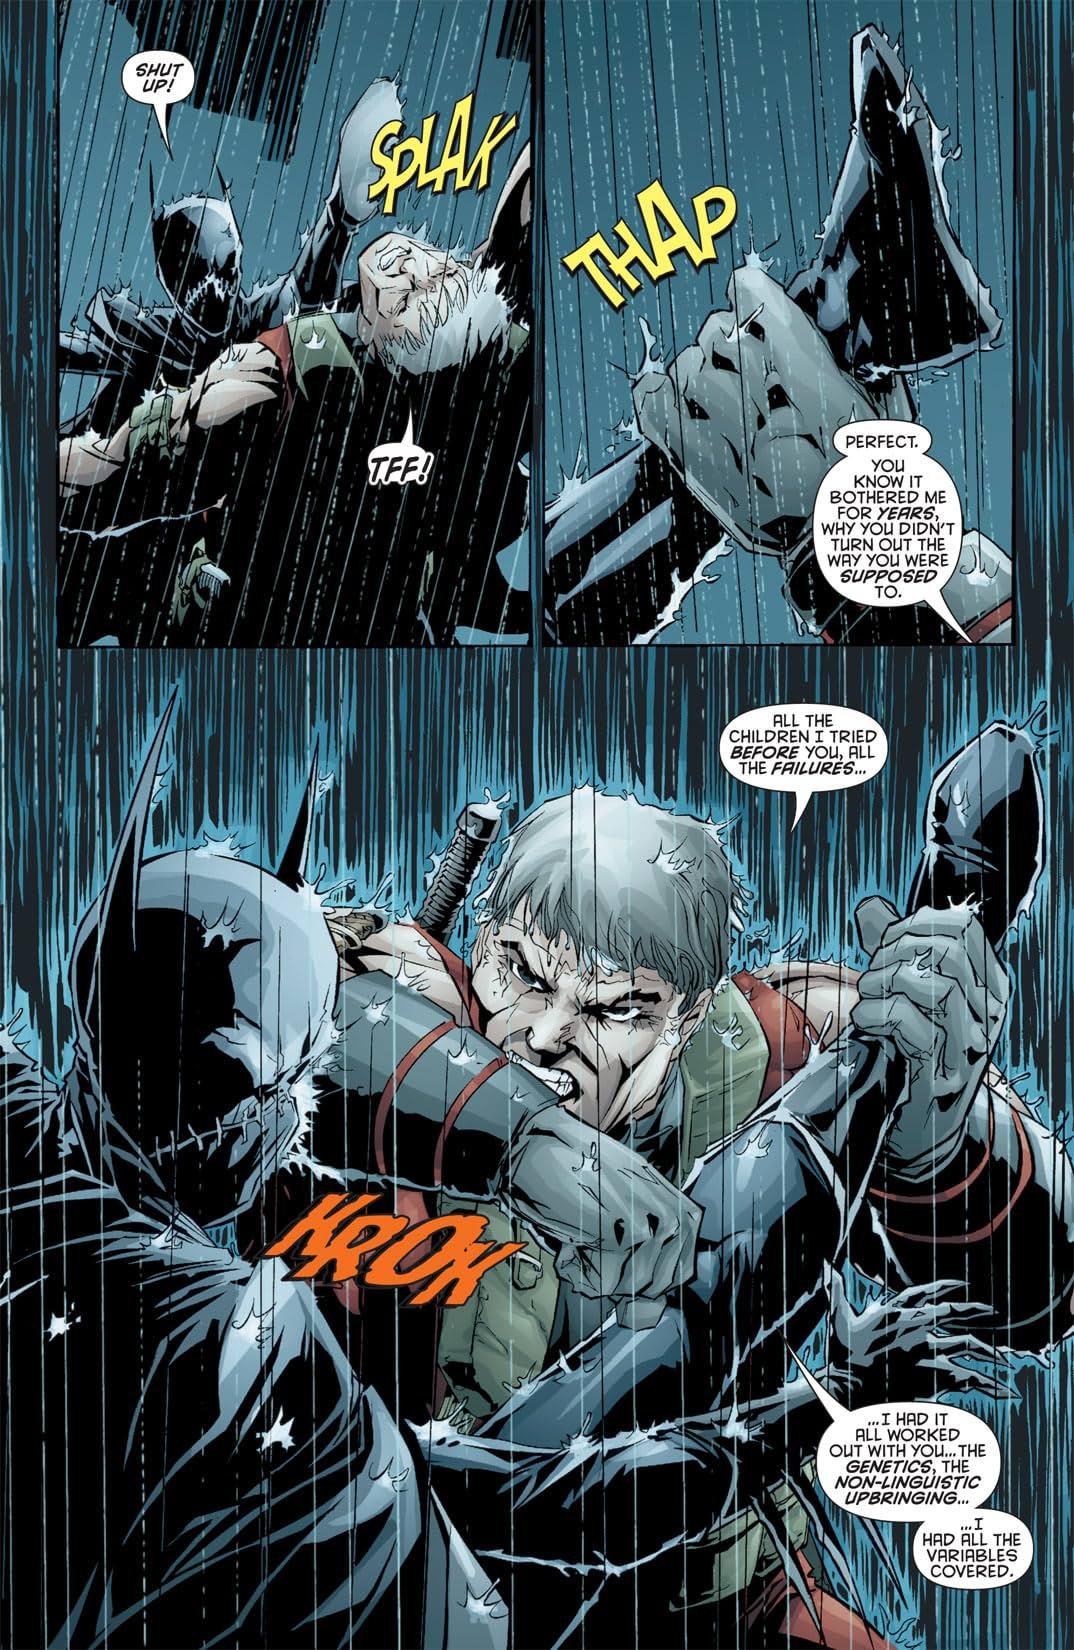 Batgirl (2008) #6 (of 6)